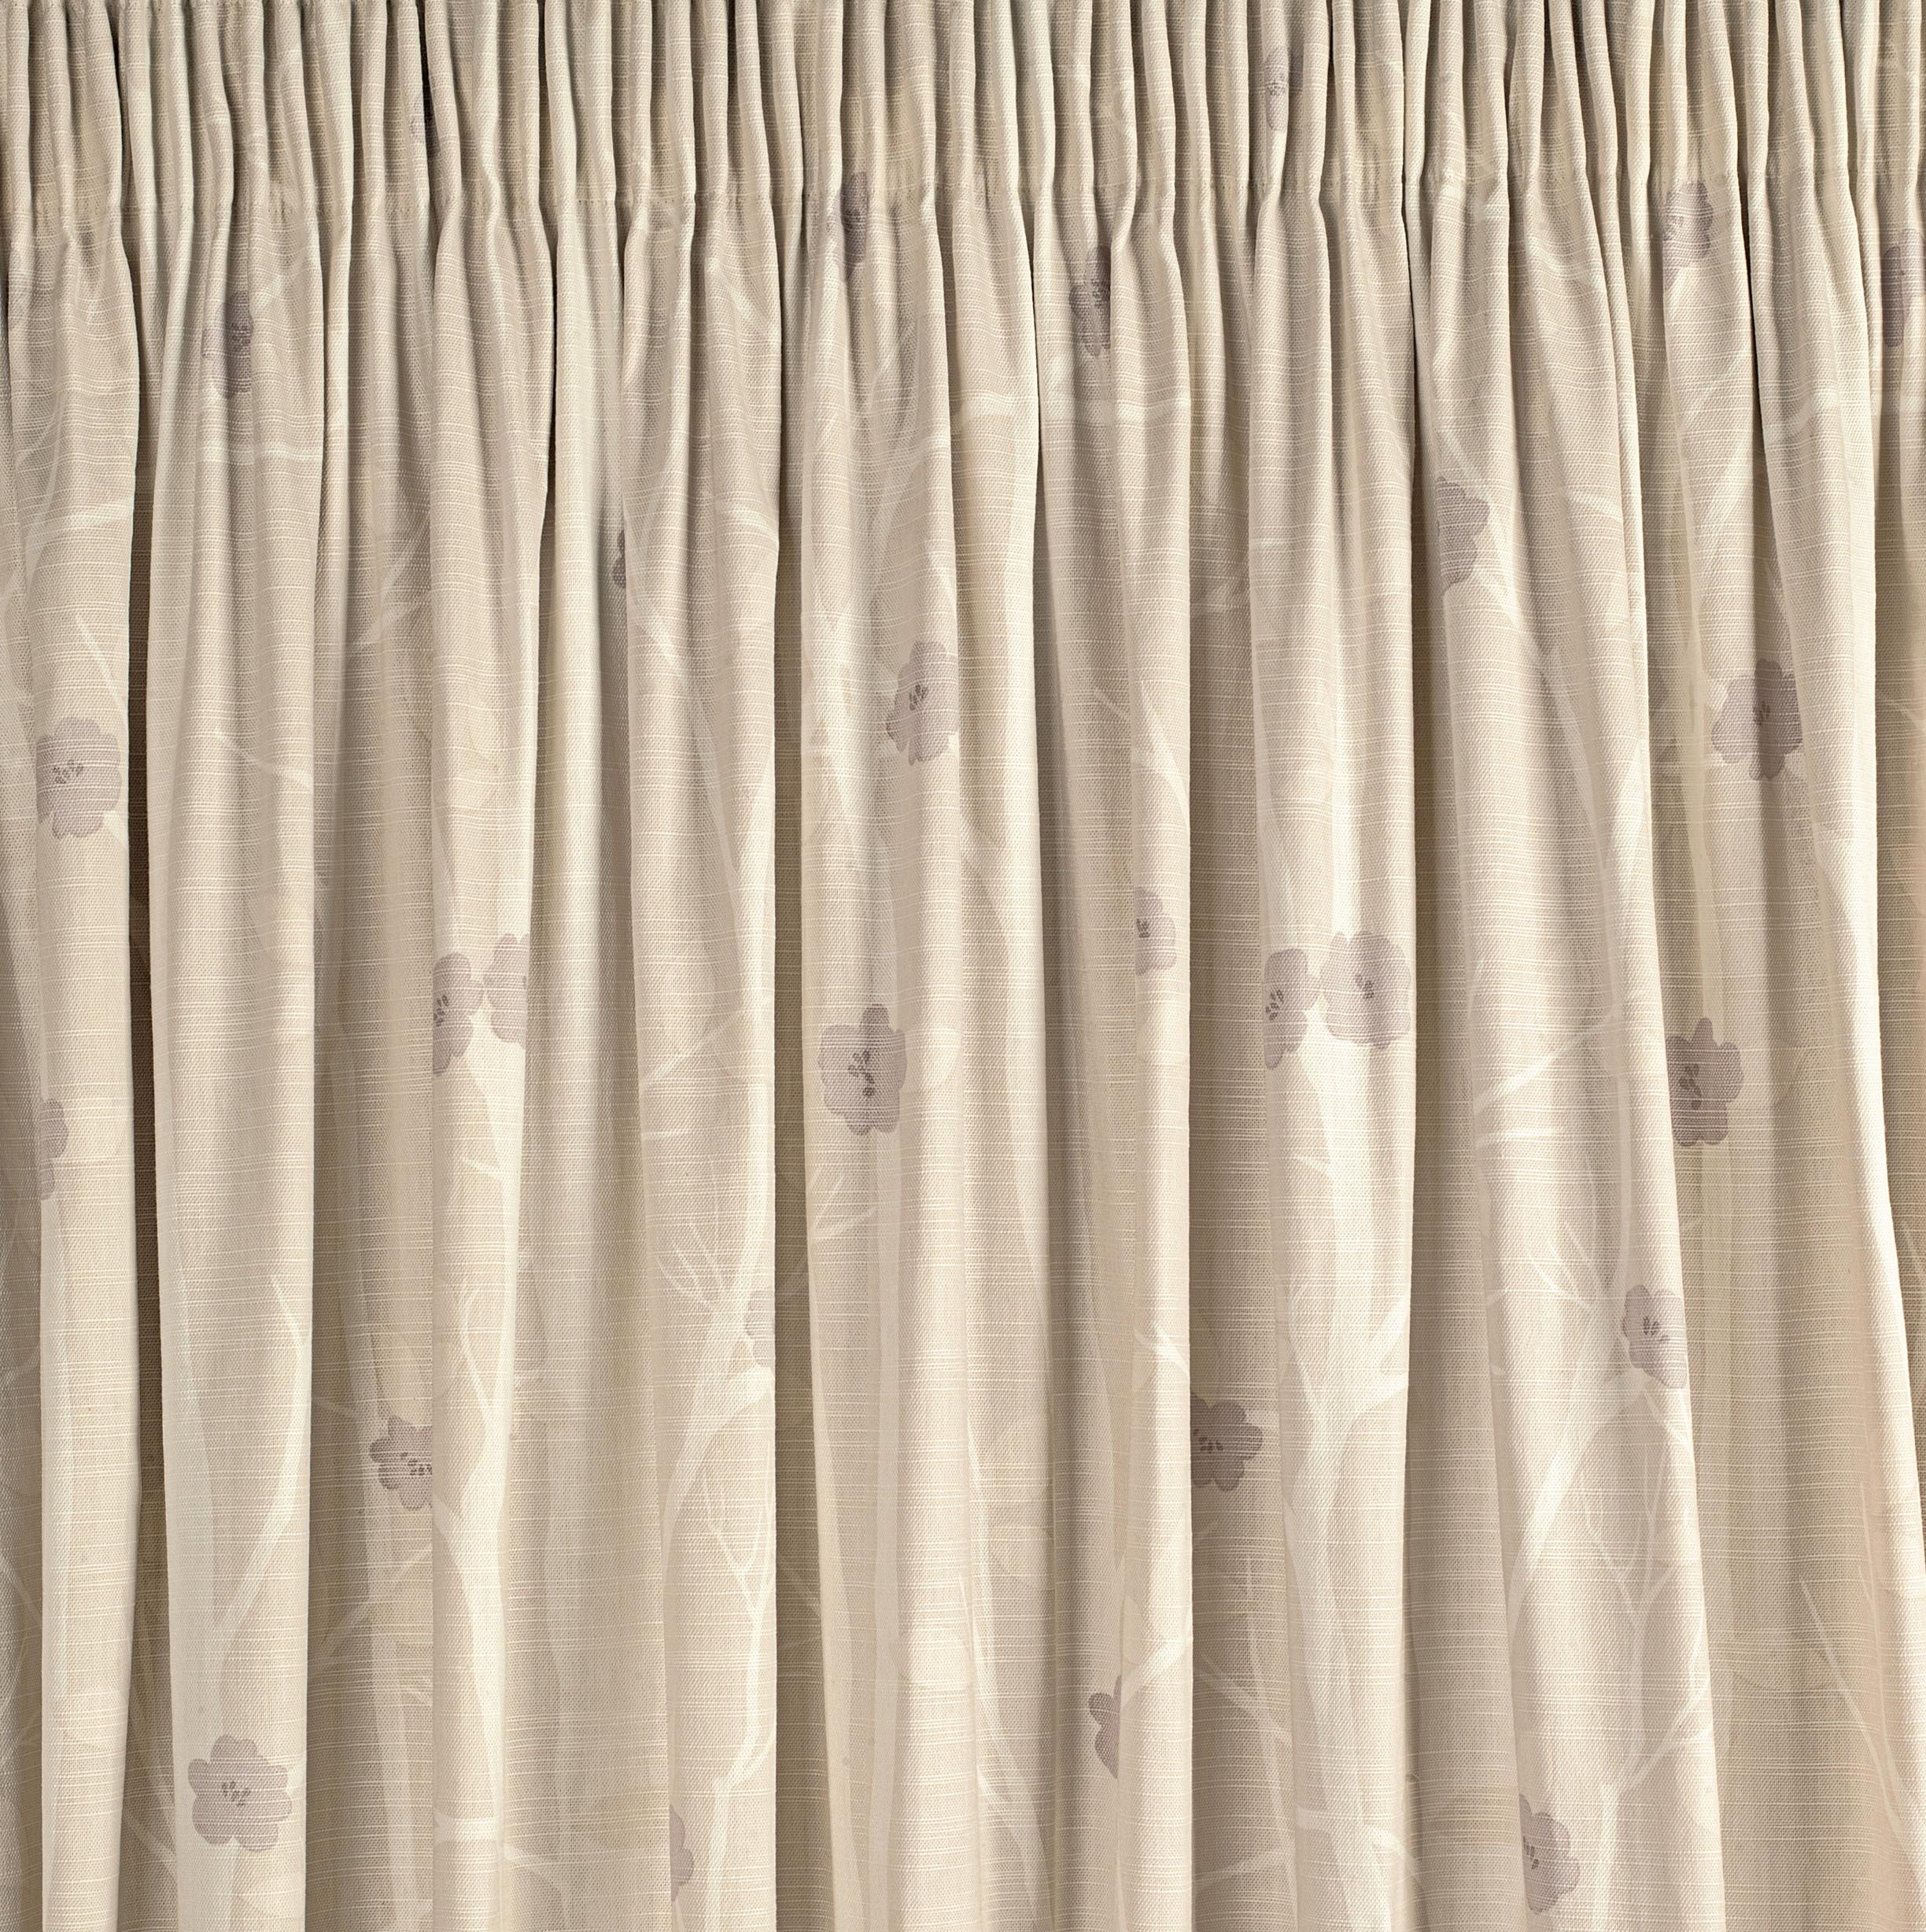 Pencil Pleat Curtains On A Pole